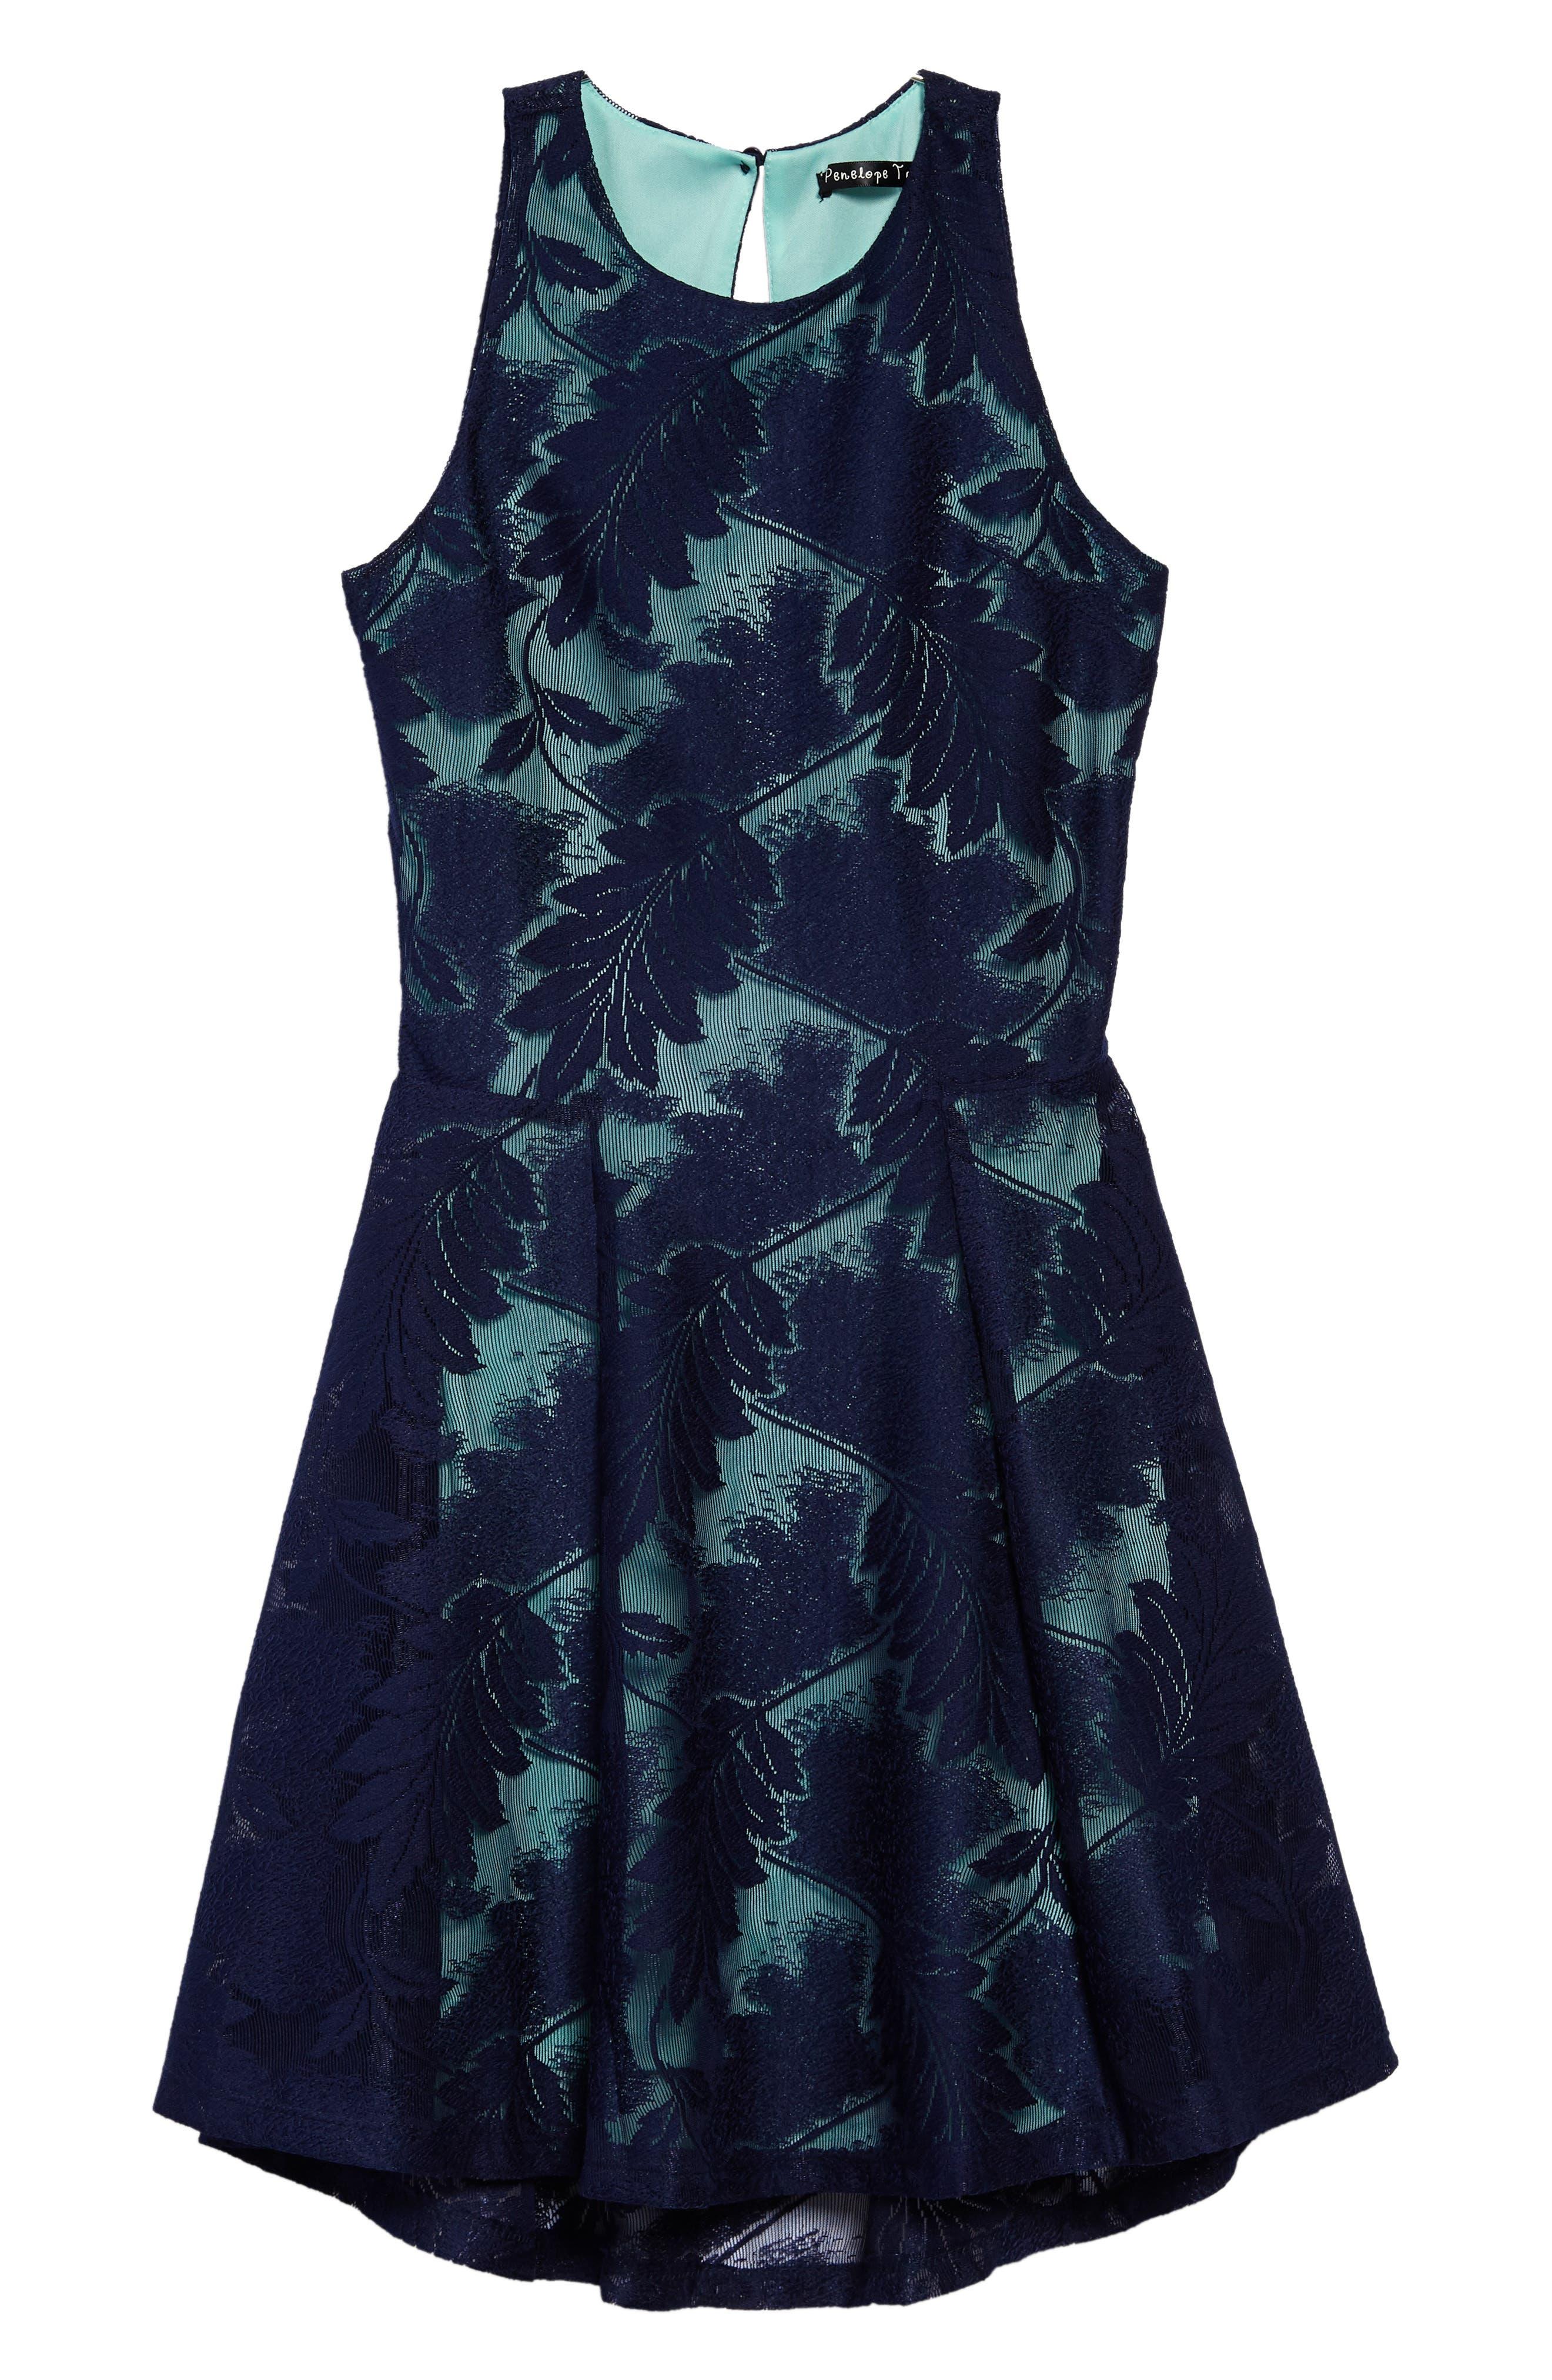 Main Image - Penelope Tree Jessica Dress (Big Girls)